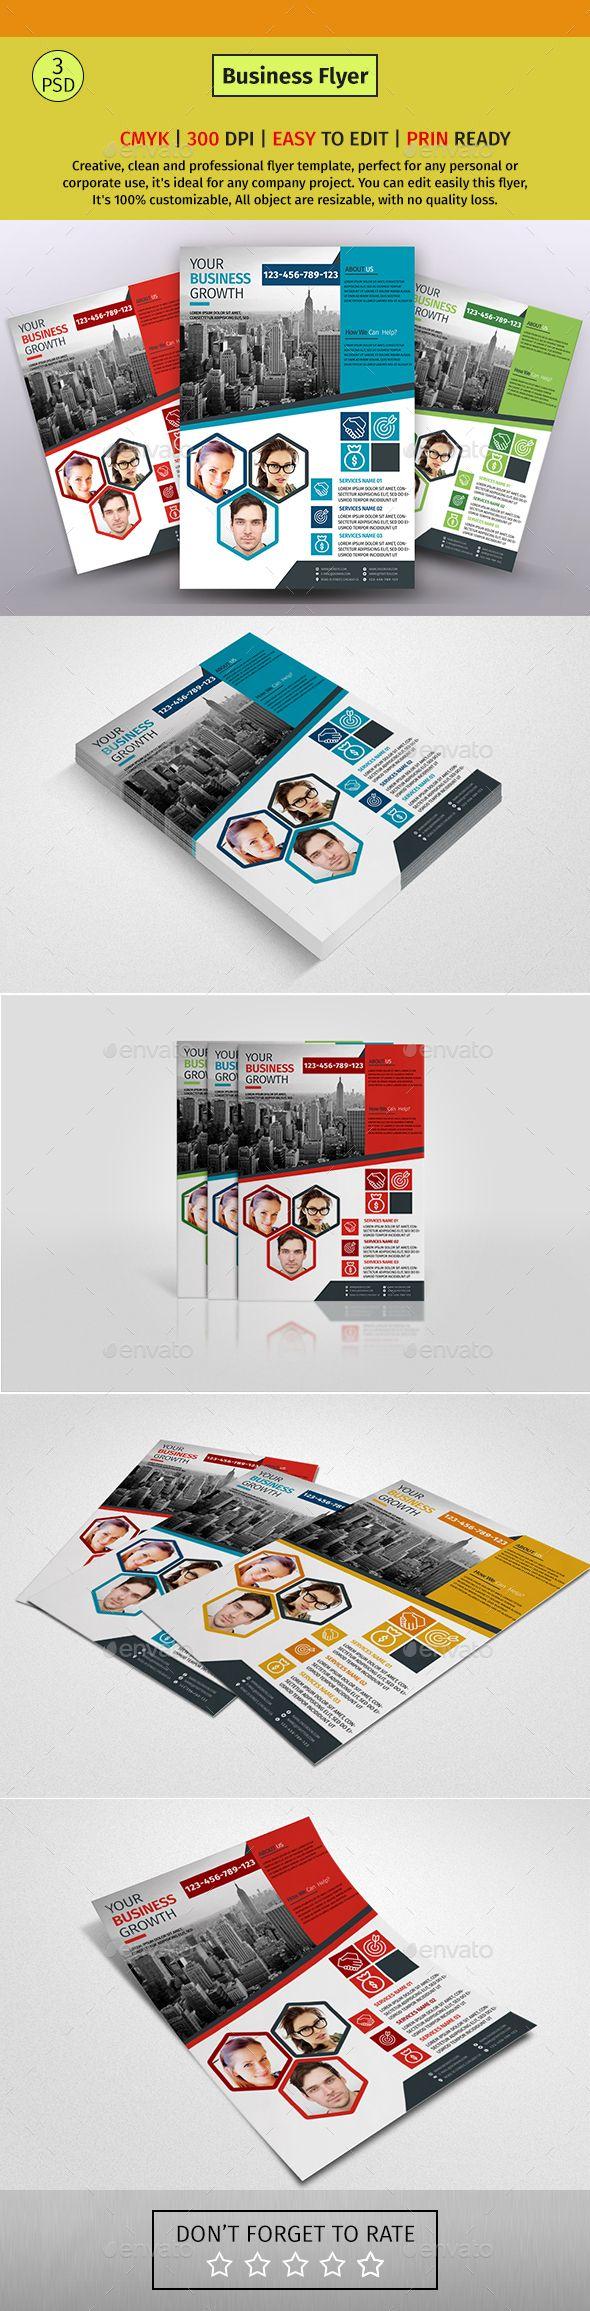 a4 corporate business flyer 65 flyer pinterest